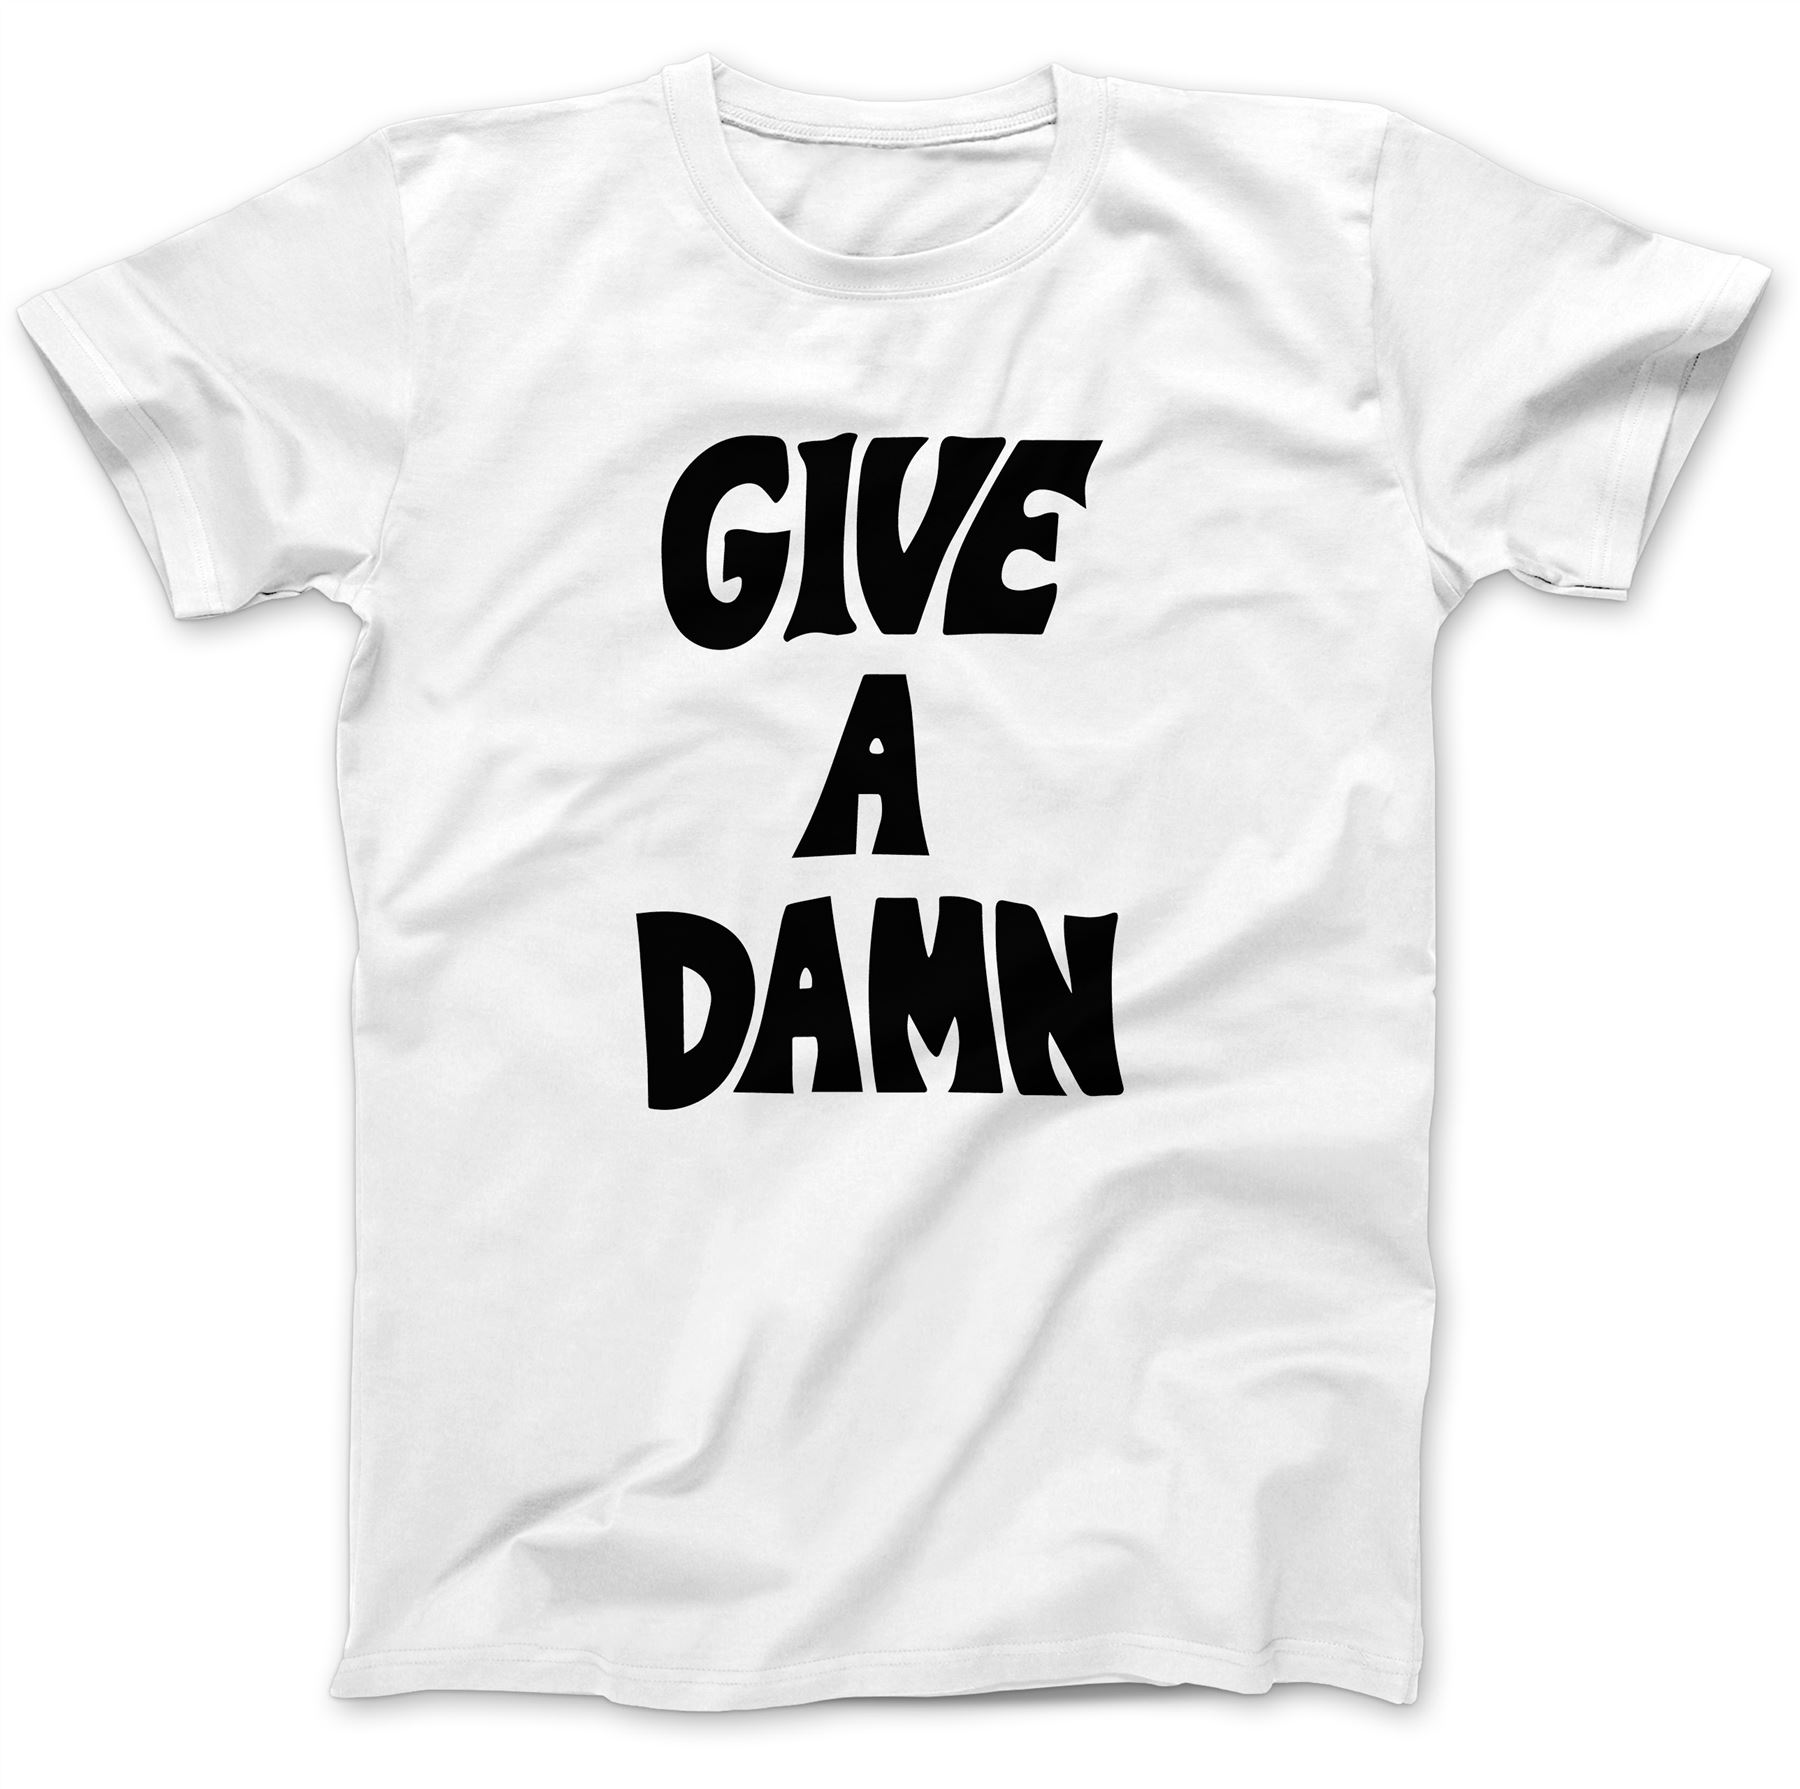 Give-A-Damn-As-Worn-By-Alex-Turner-T-Shirt-100-Premium-Cotton-Music-Gift miniatuur 13